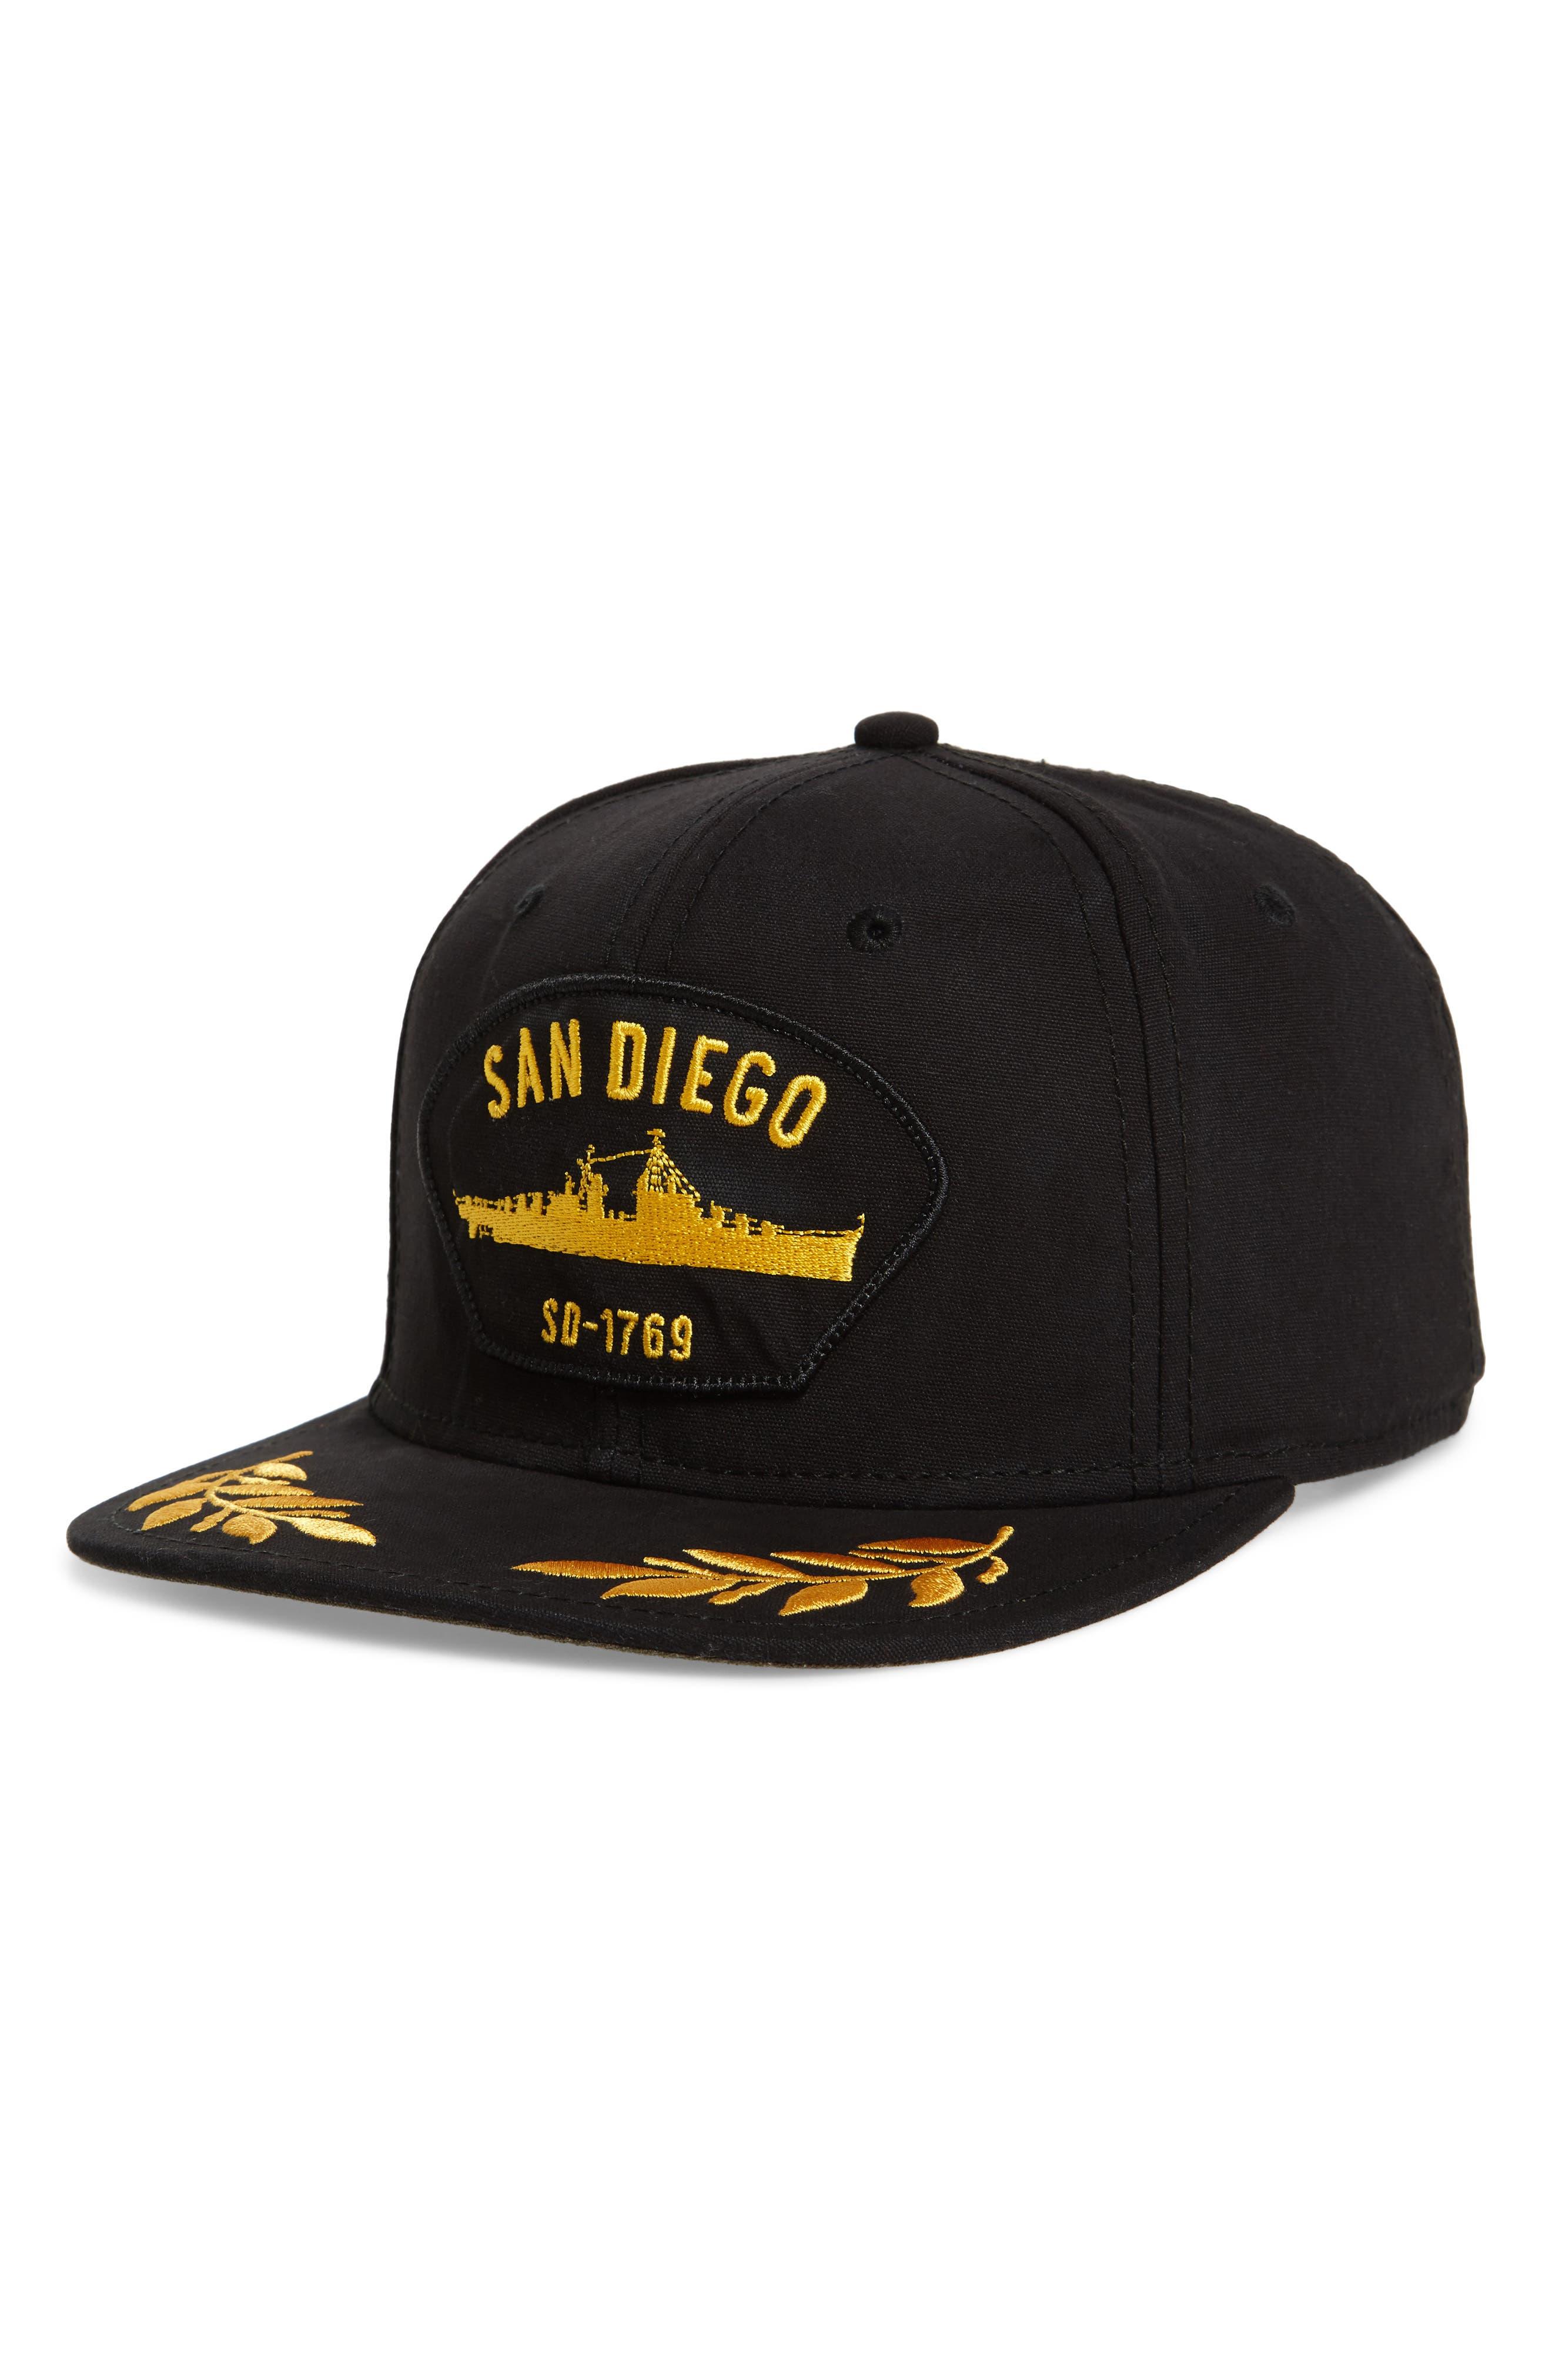 Main Image - Goorin Brothers San Diego Snapback Baseball Cap